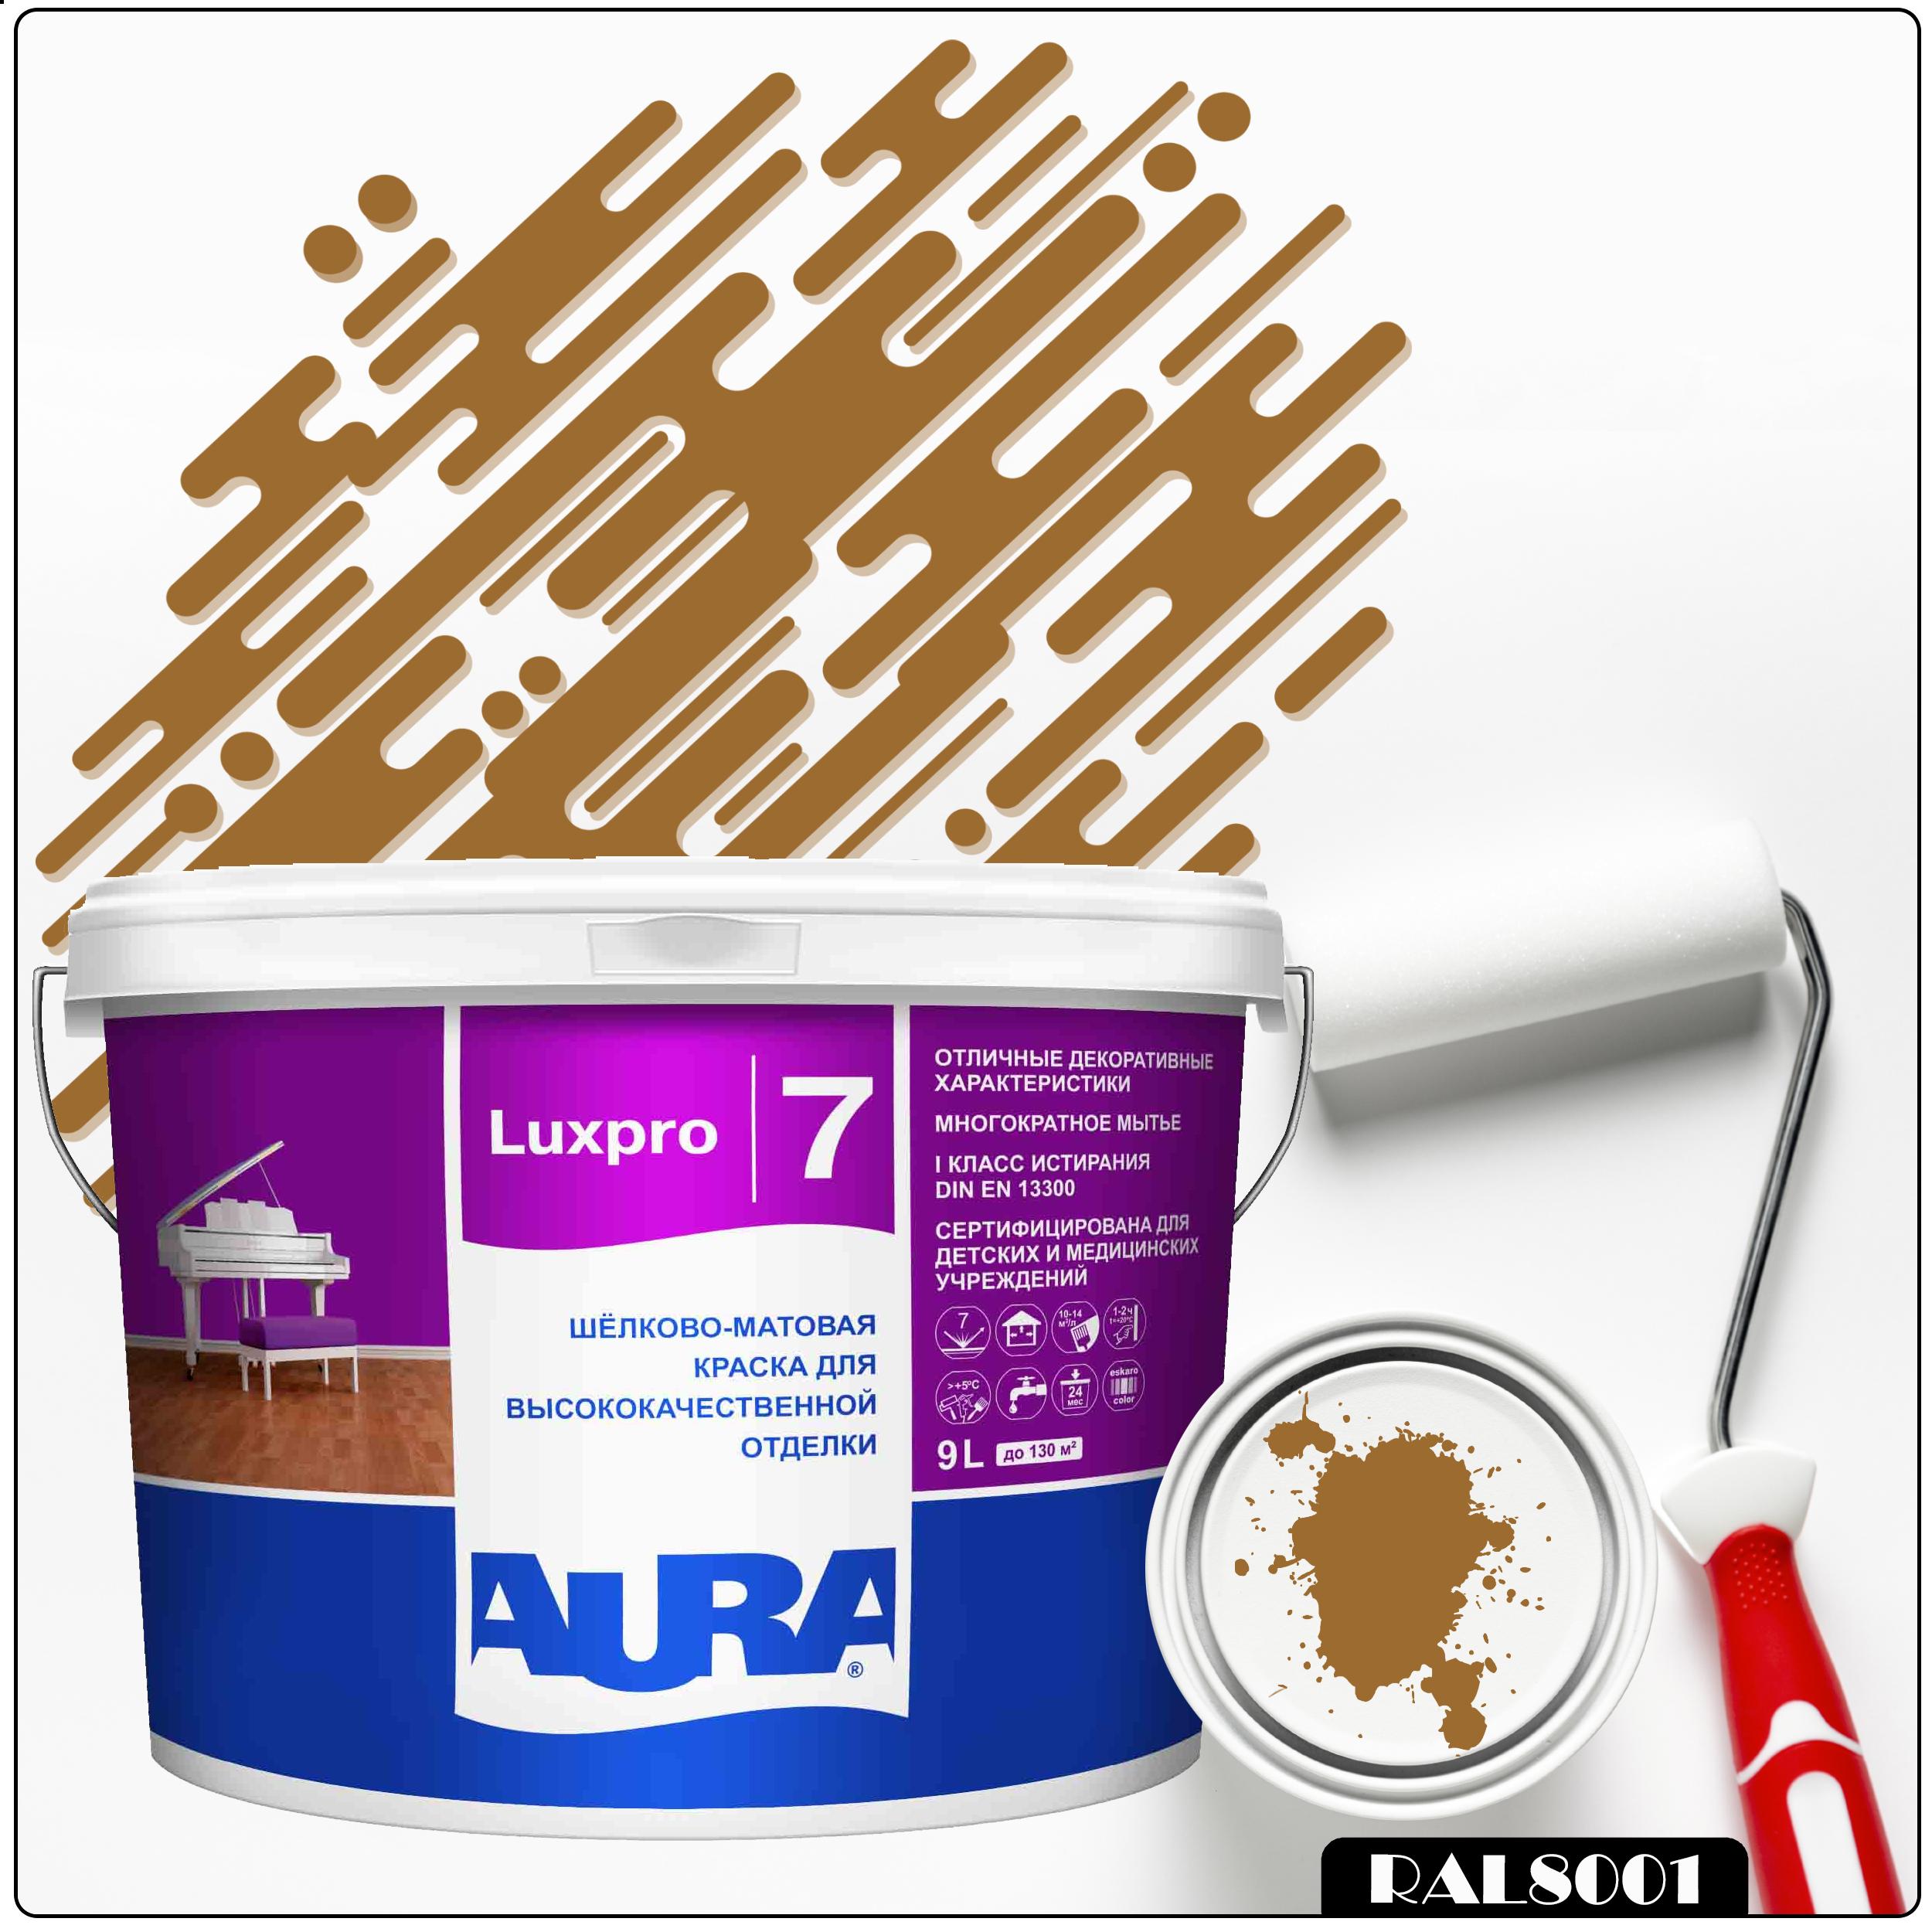 Фото 2 - Краска Aura LuxPRO 7, RAL 8001 Коричневая охра, латексная, шелково-матовая, интерьерная, 9л, Аура.